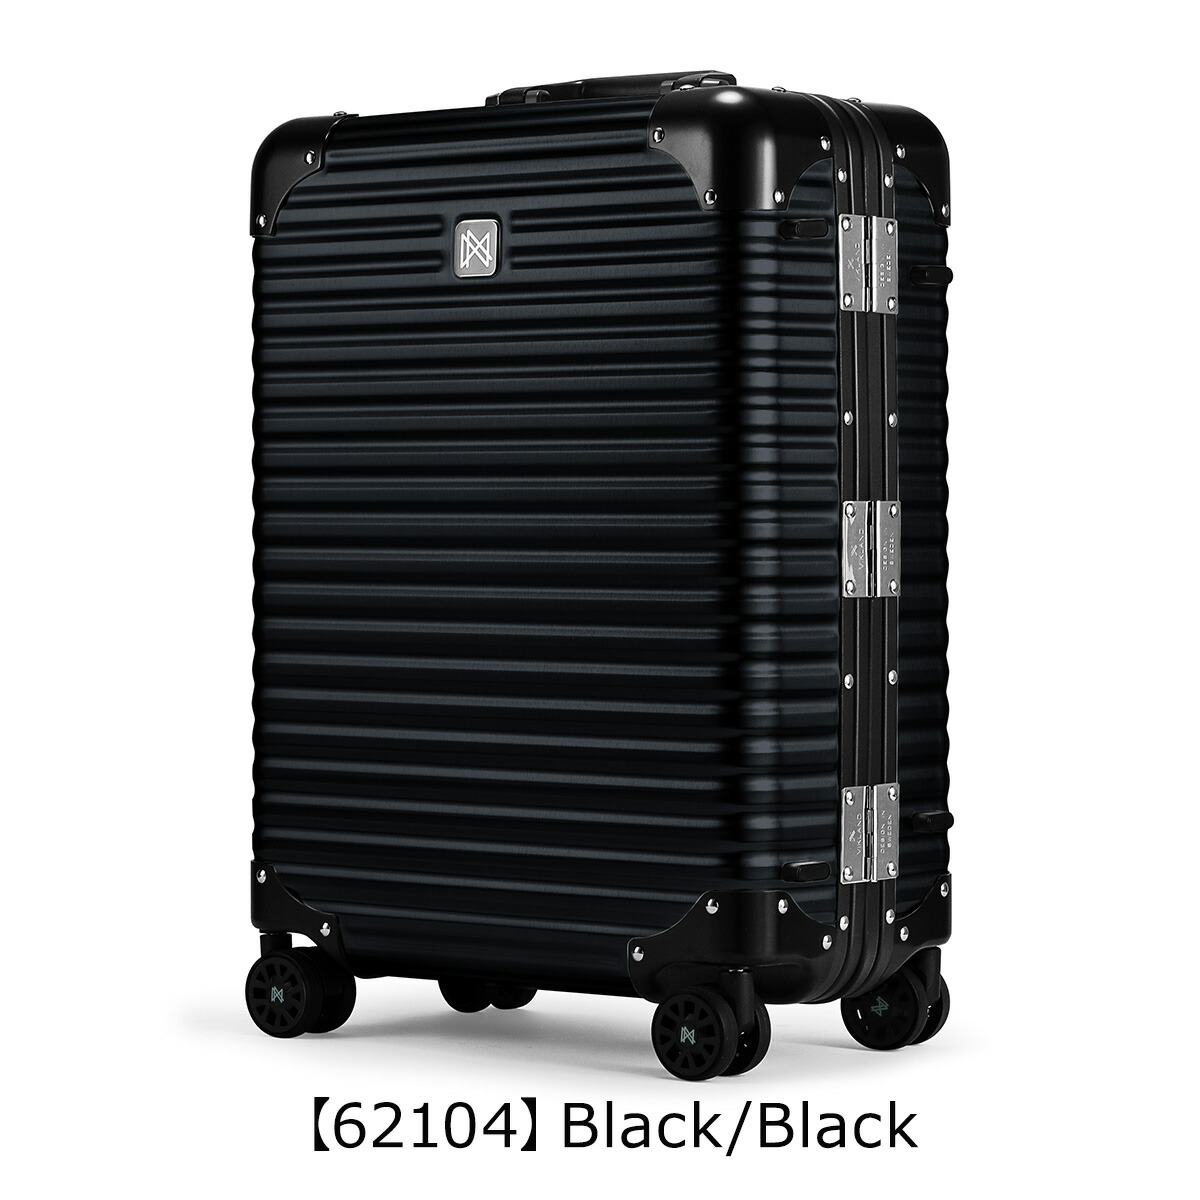 【62104】Black/Black